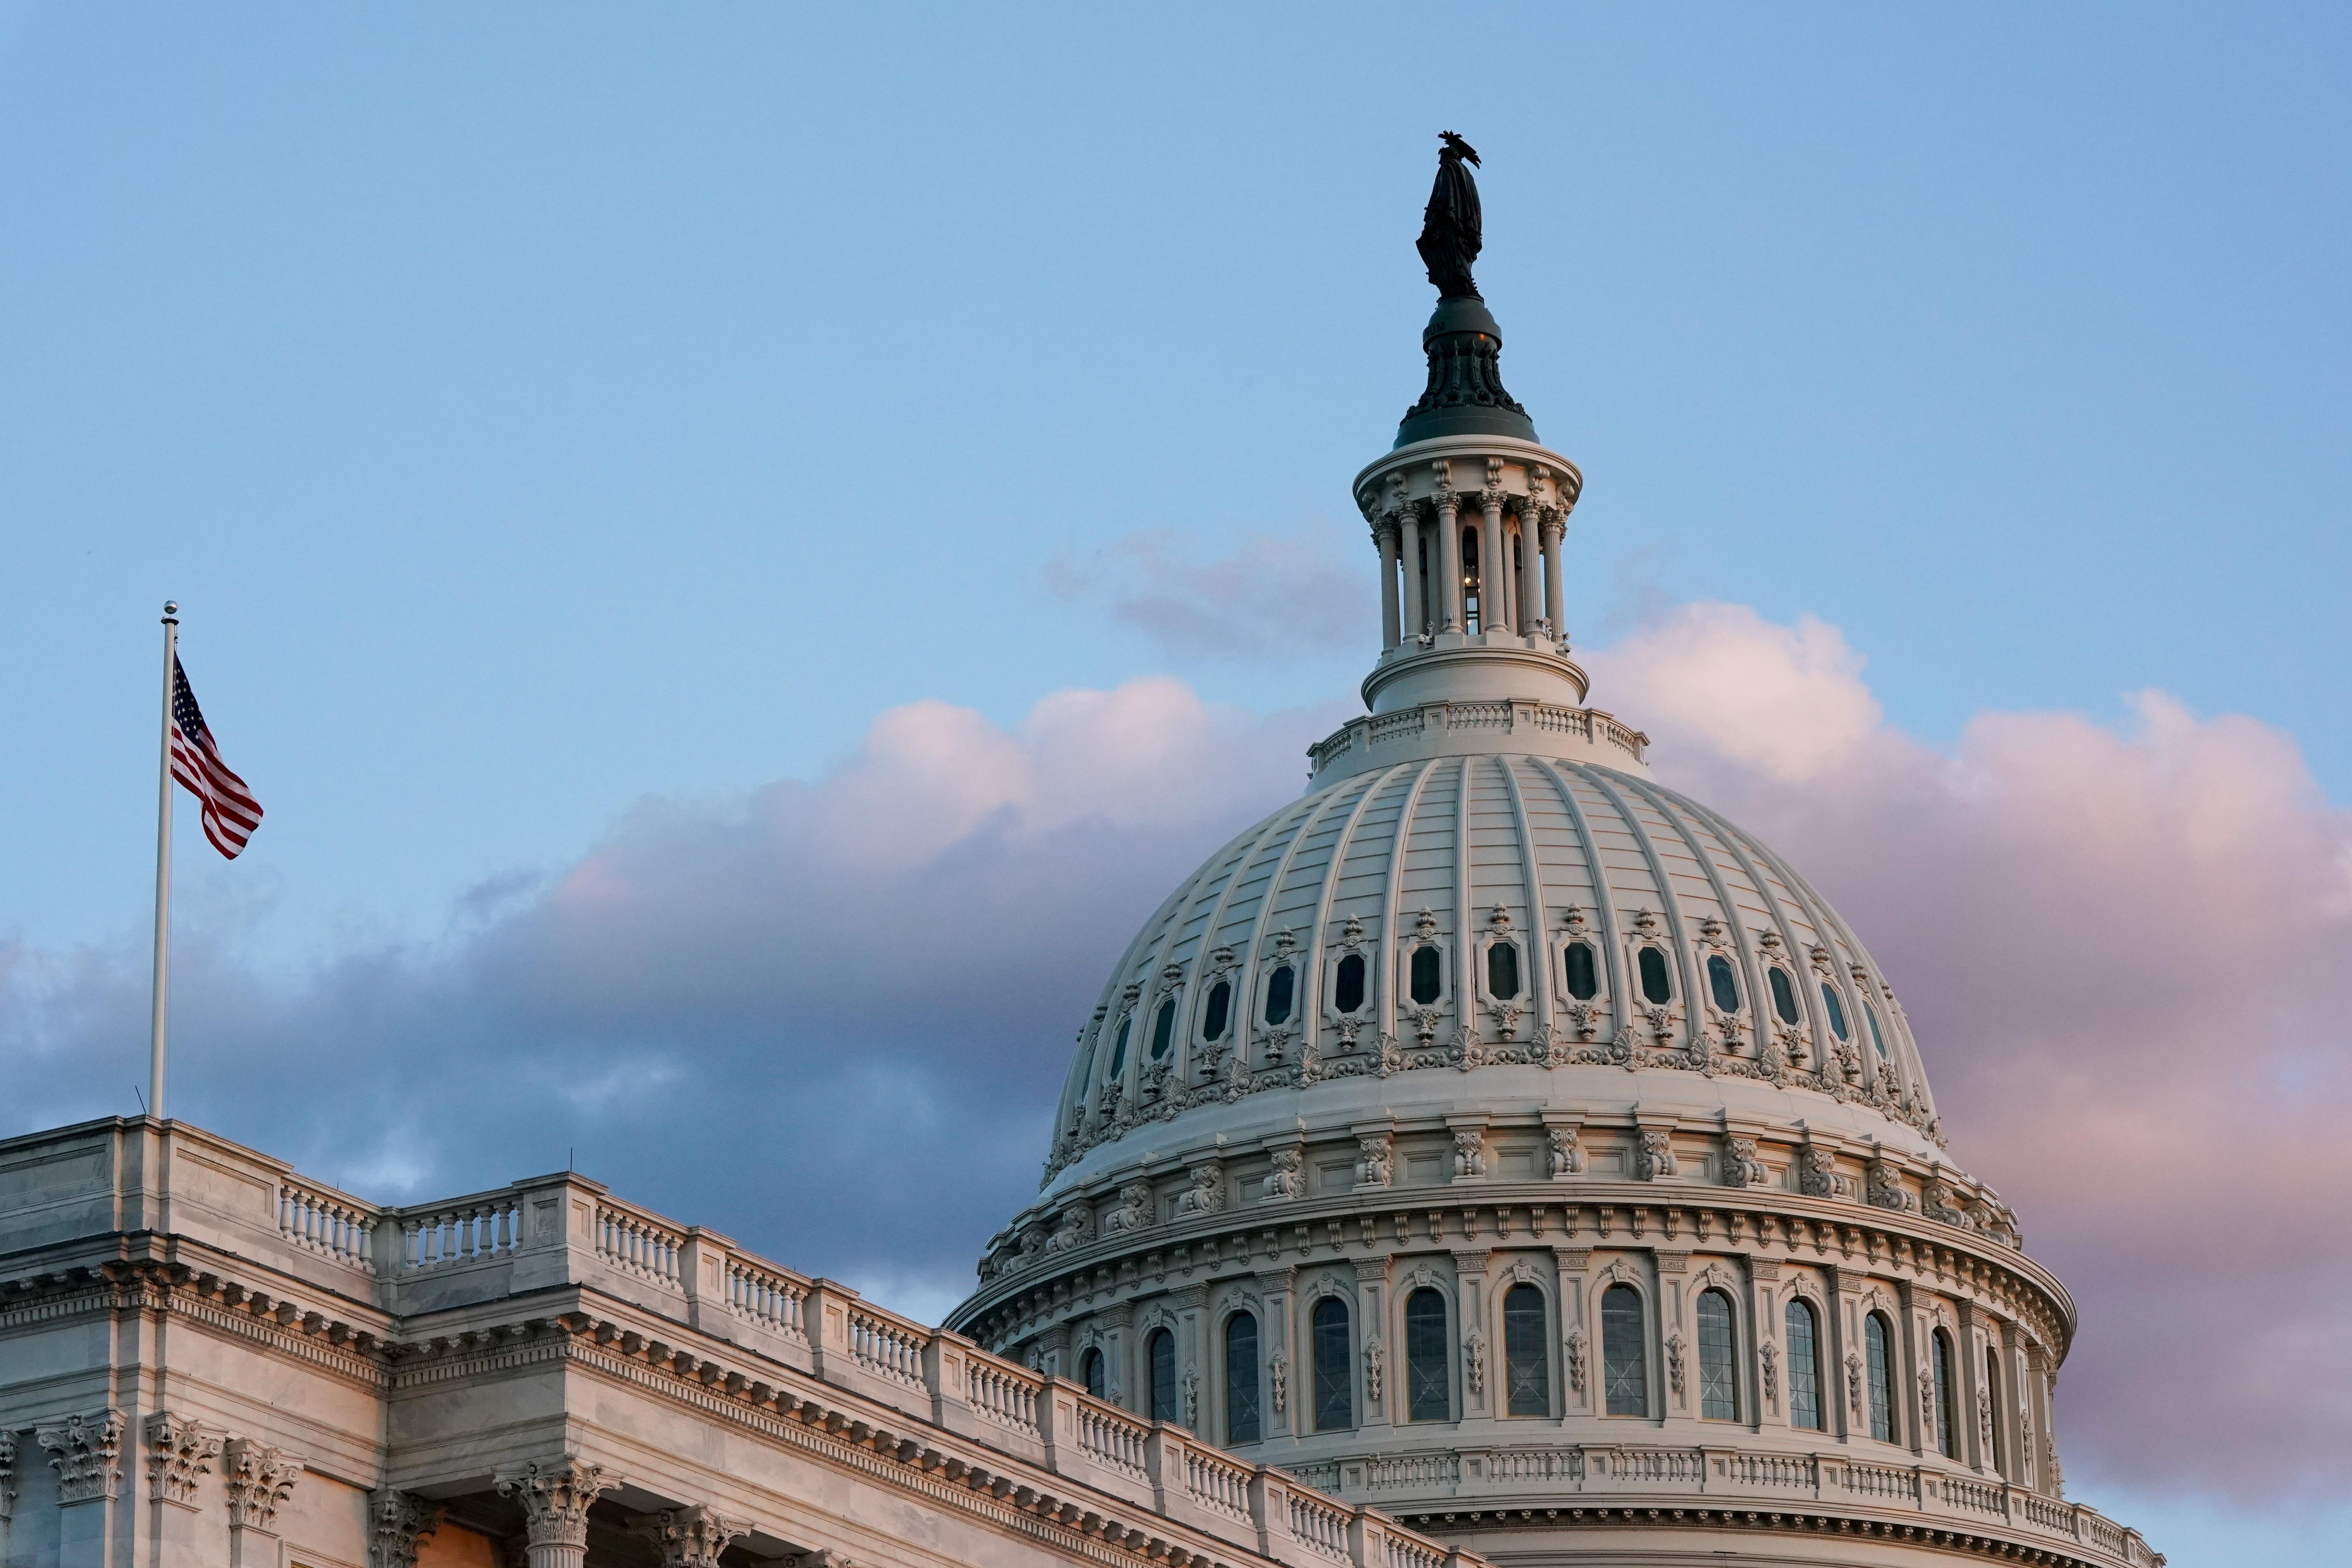 The U.S. Capitol building on Capitol Hill, seen during sunset in Washington, U.S., September 30, 2021. REUTERS/Elizabeth Frantz/File Photo